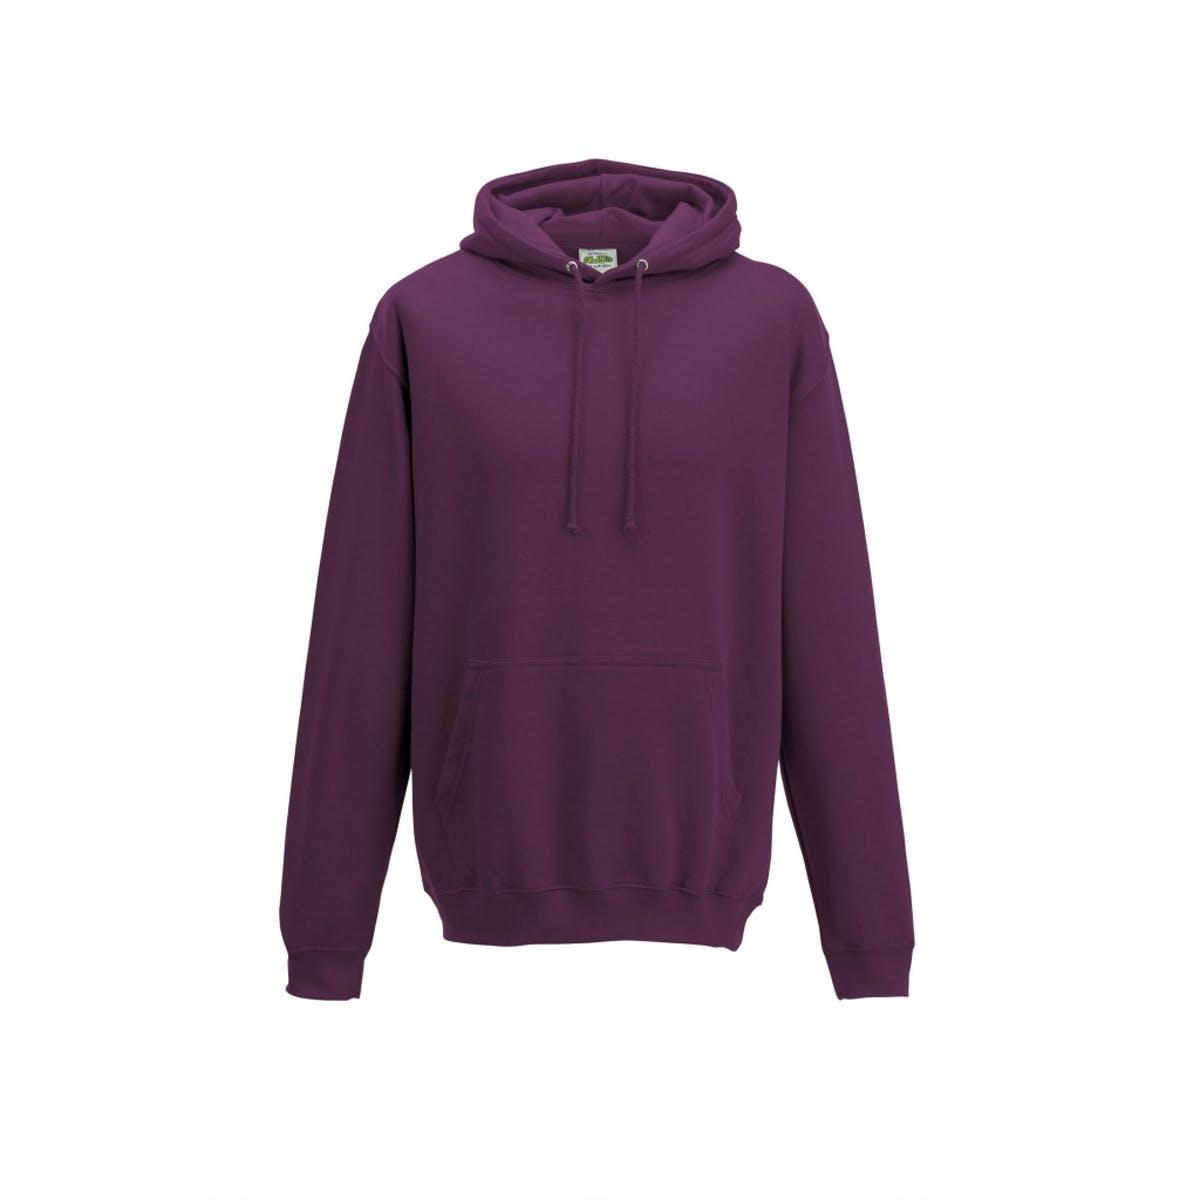 plum college hoodies